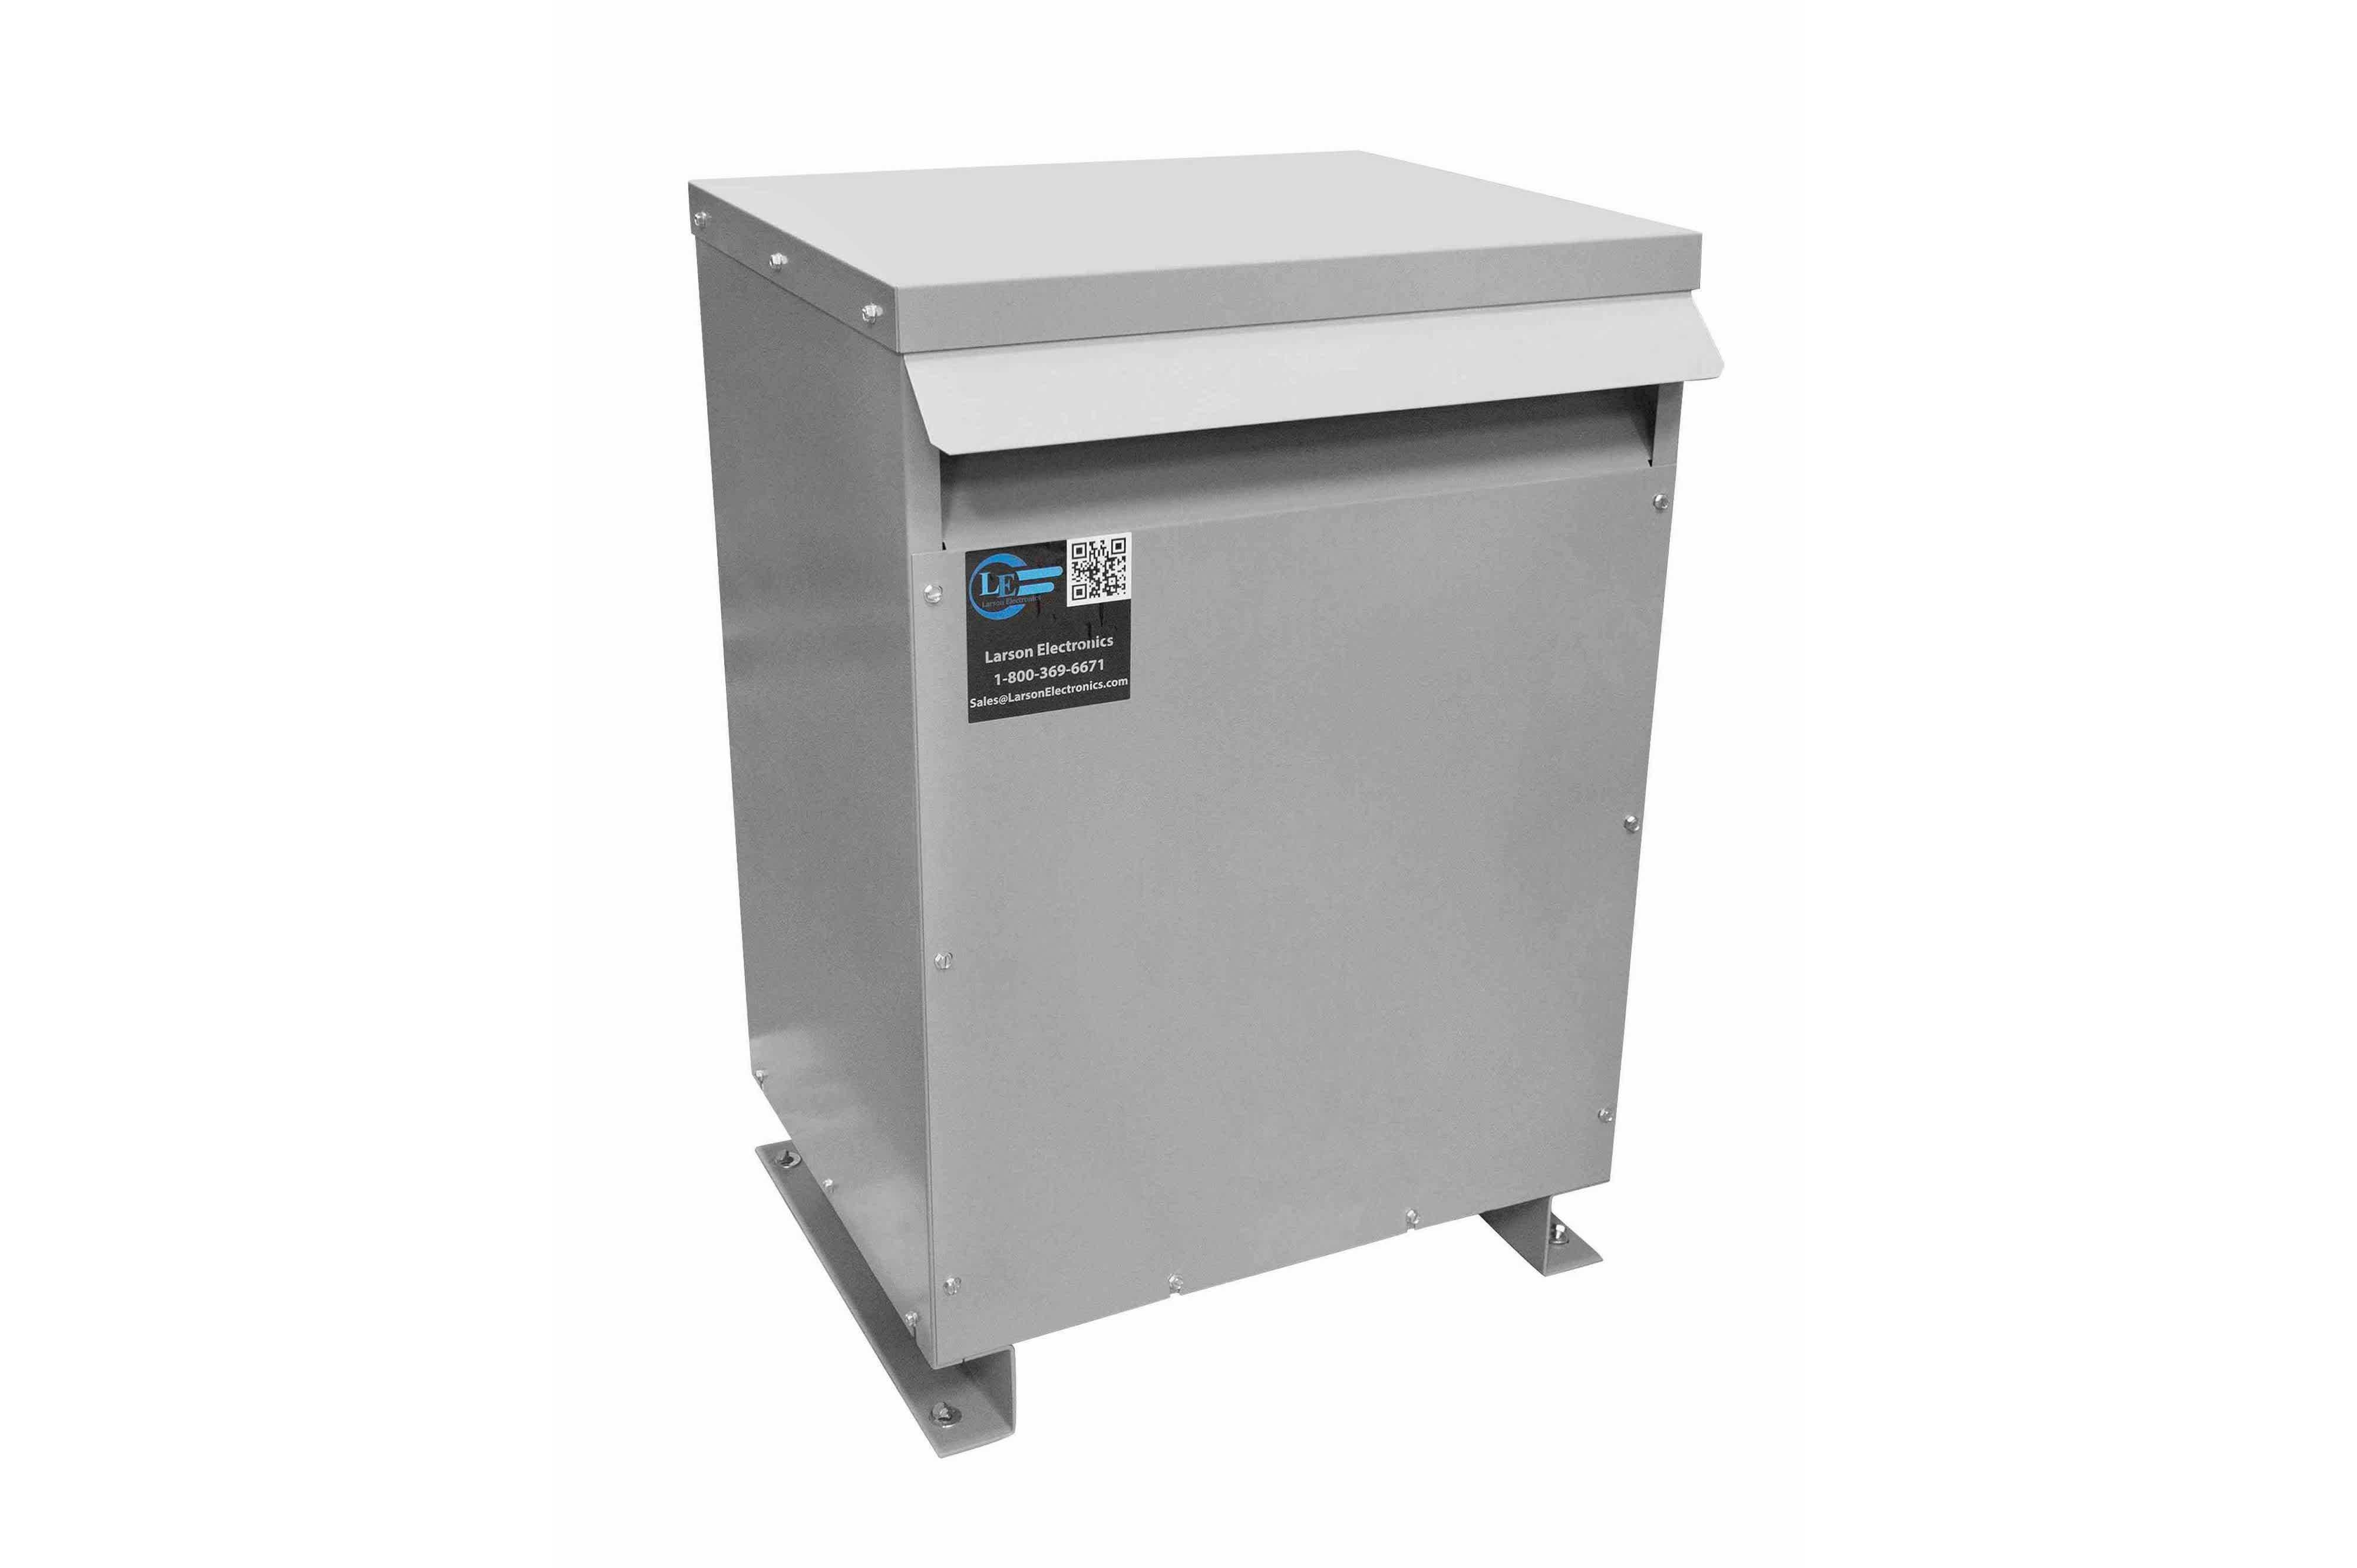 26 kVA 3PH Isolation Transformer, 600V Wye Primary, 415Y/240 Wye-N Secondary, N3R, Ventilated, 60 Hz